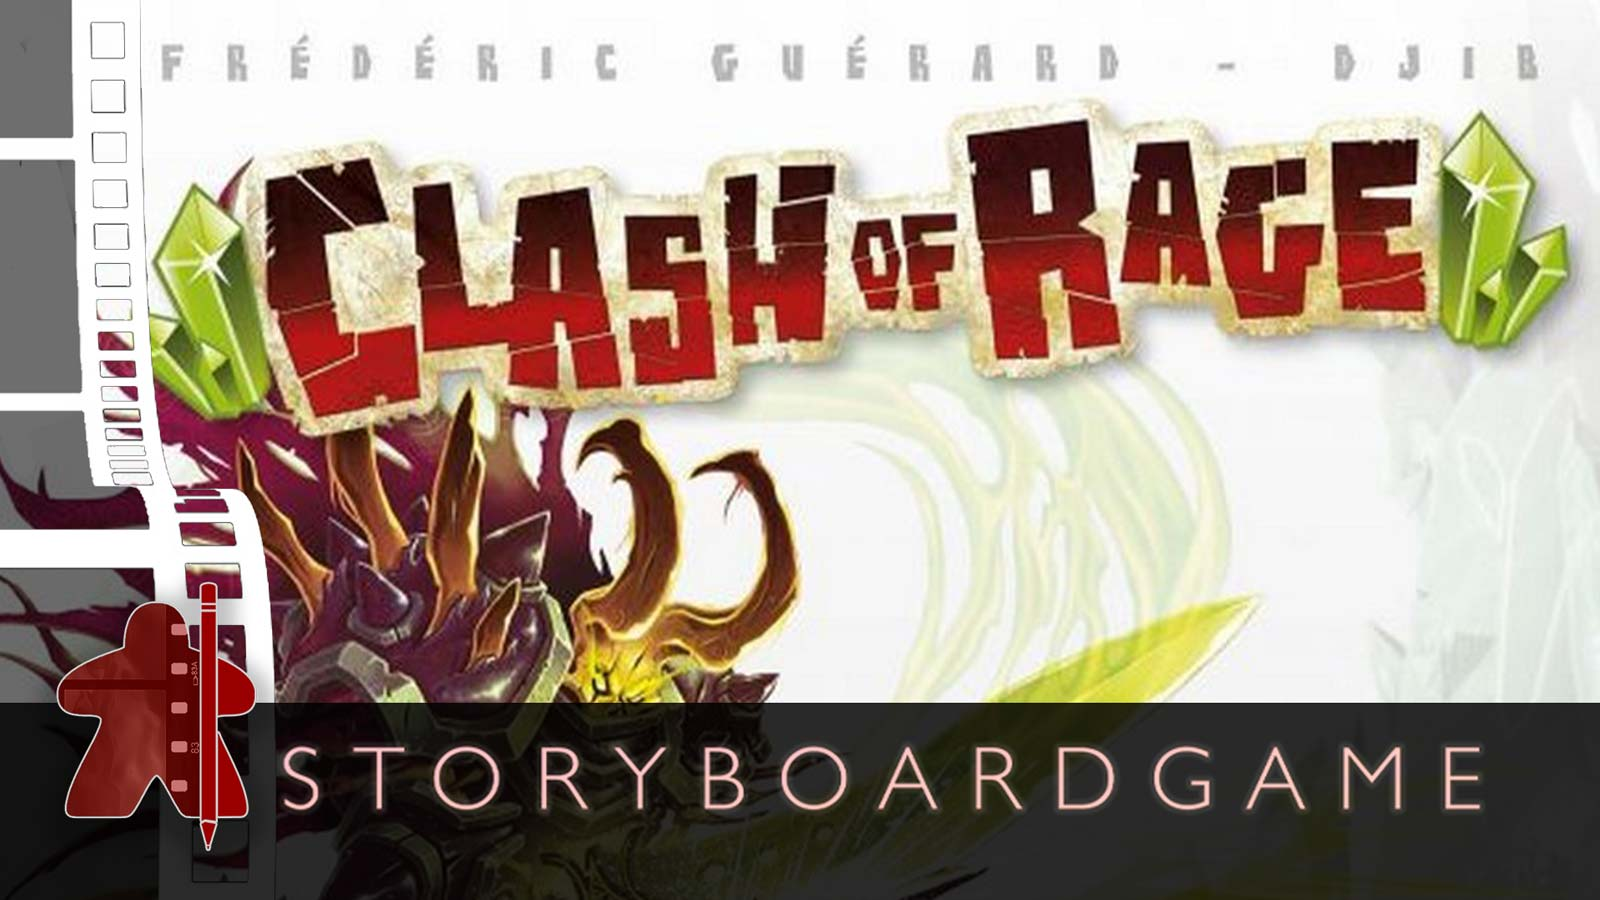 Storyboardgame – Clash of Rage